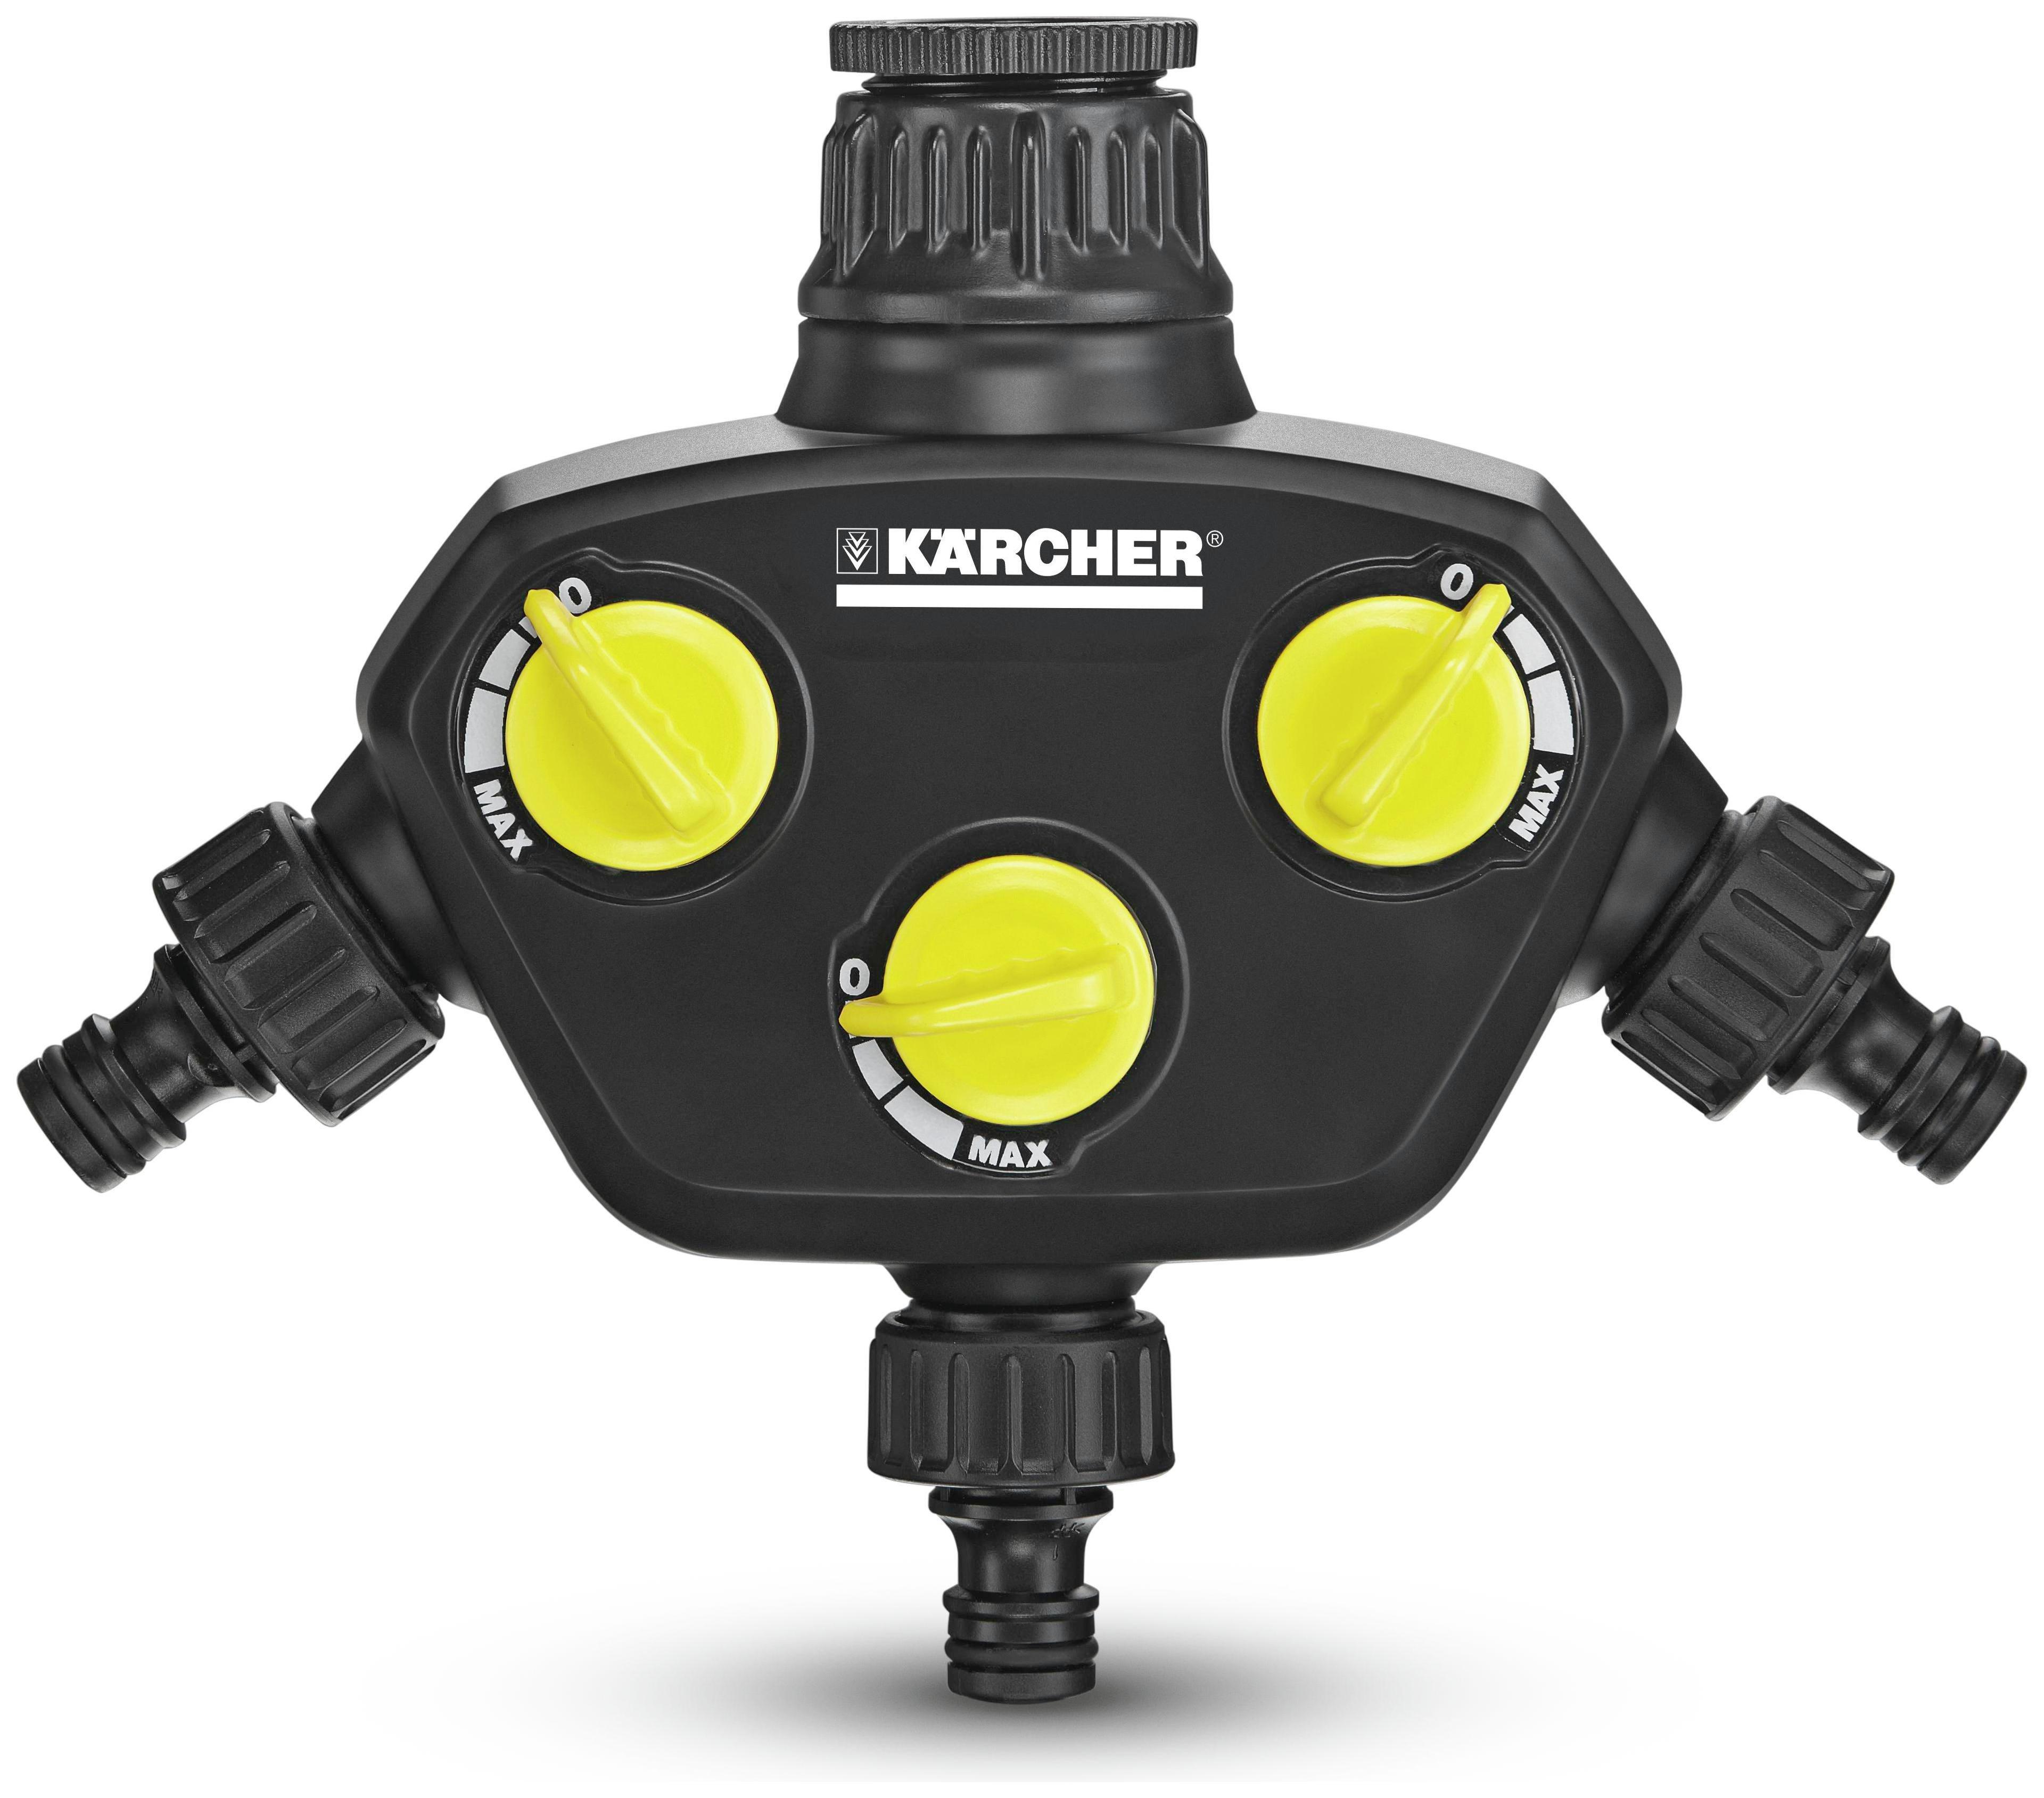 Karcher 3-way Tap Adaptor. lowest price